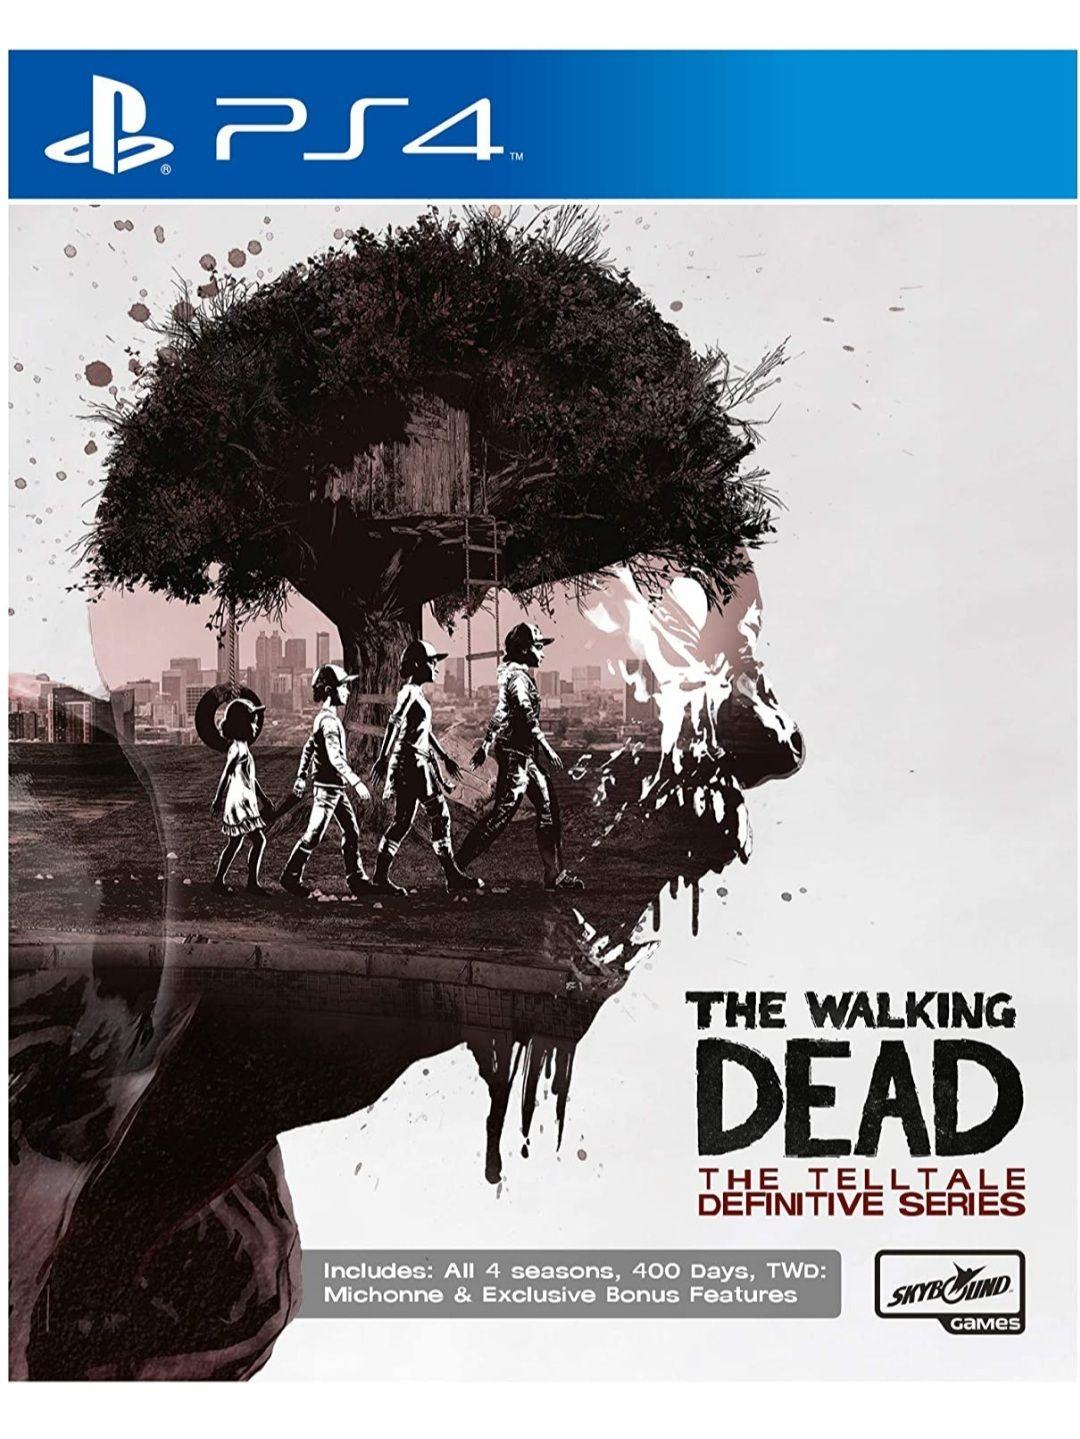 The Walking Dead The Telltale Definitive Series (PS4)